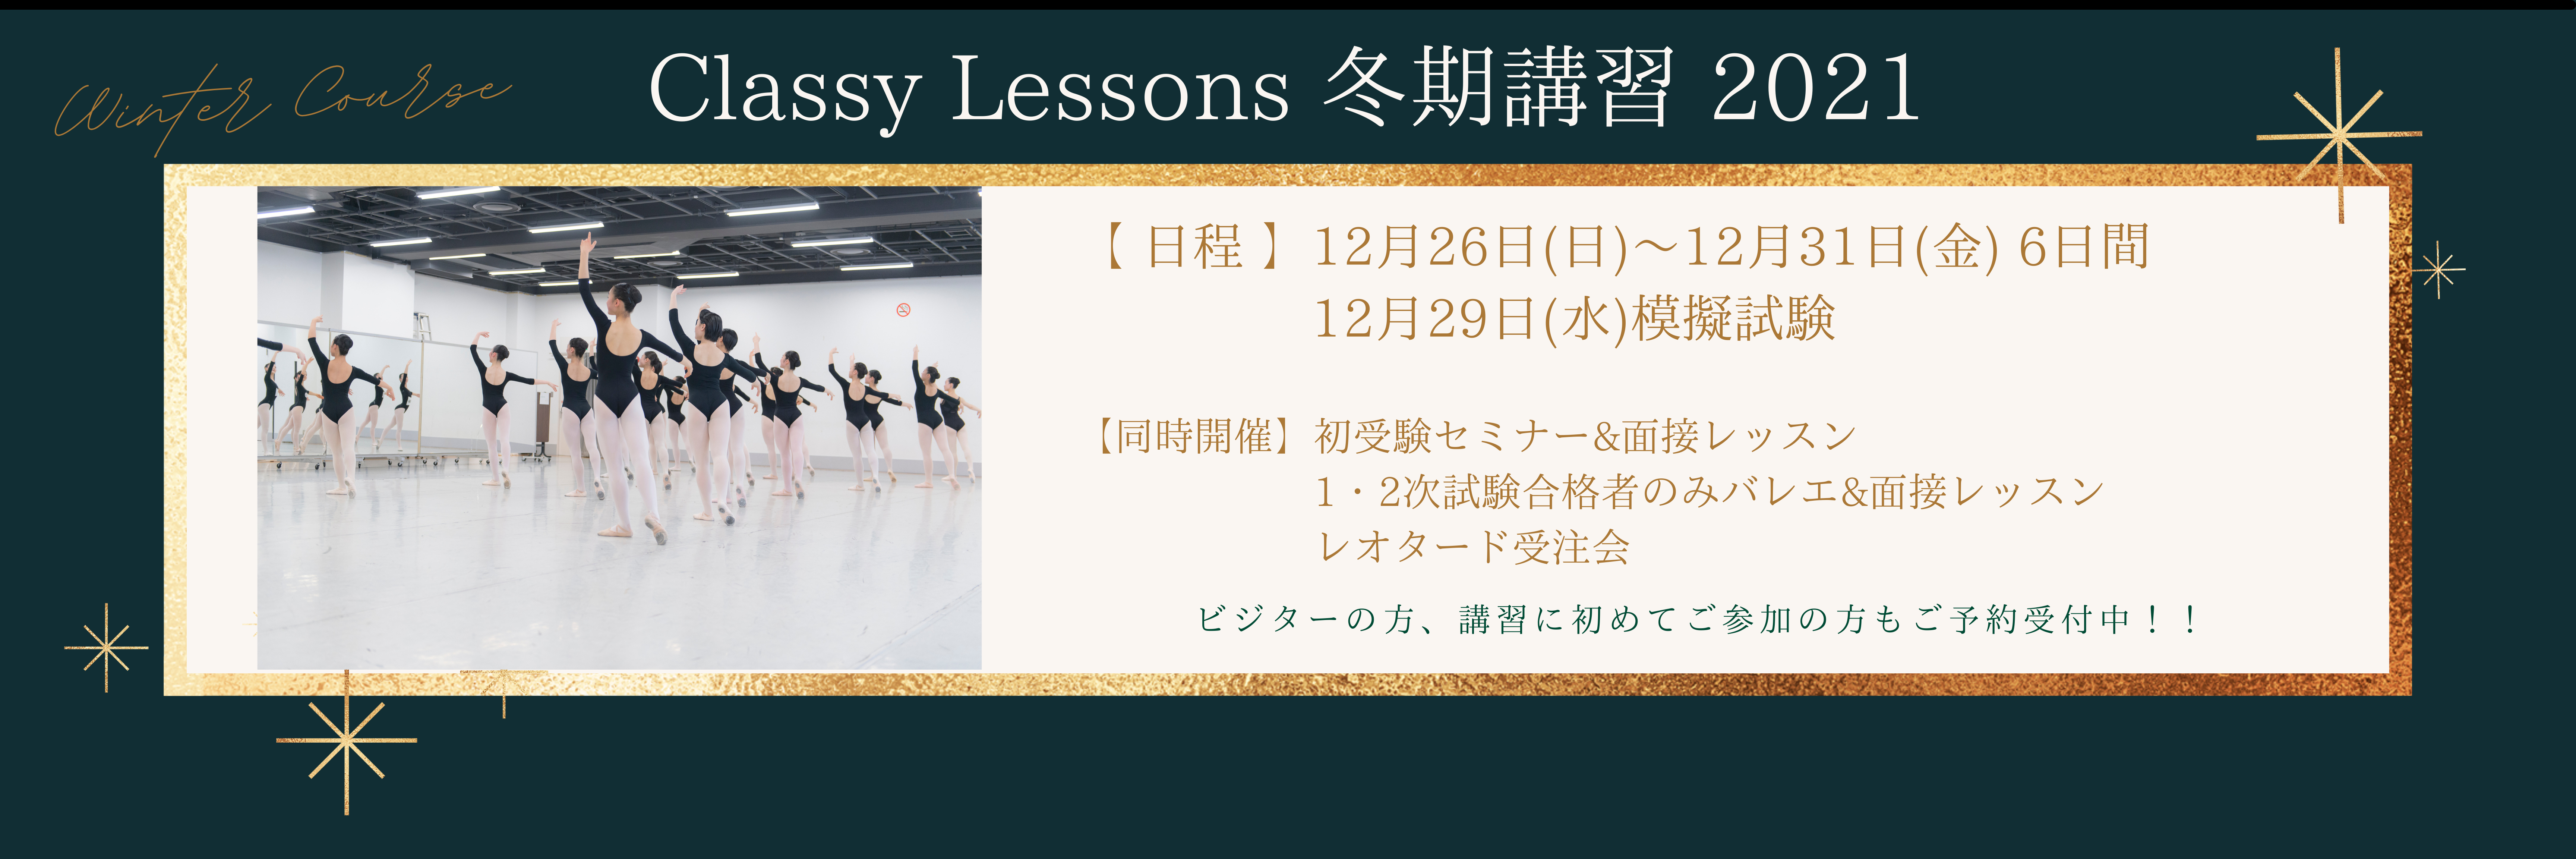 Classy Lessons 冬季講習 2021